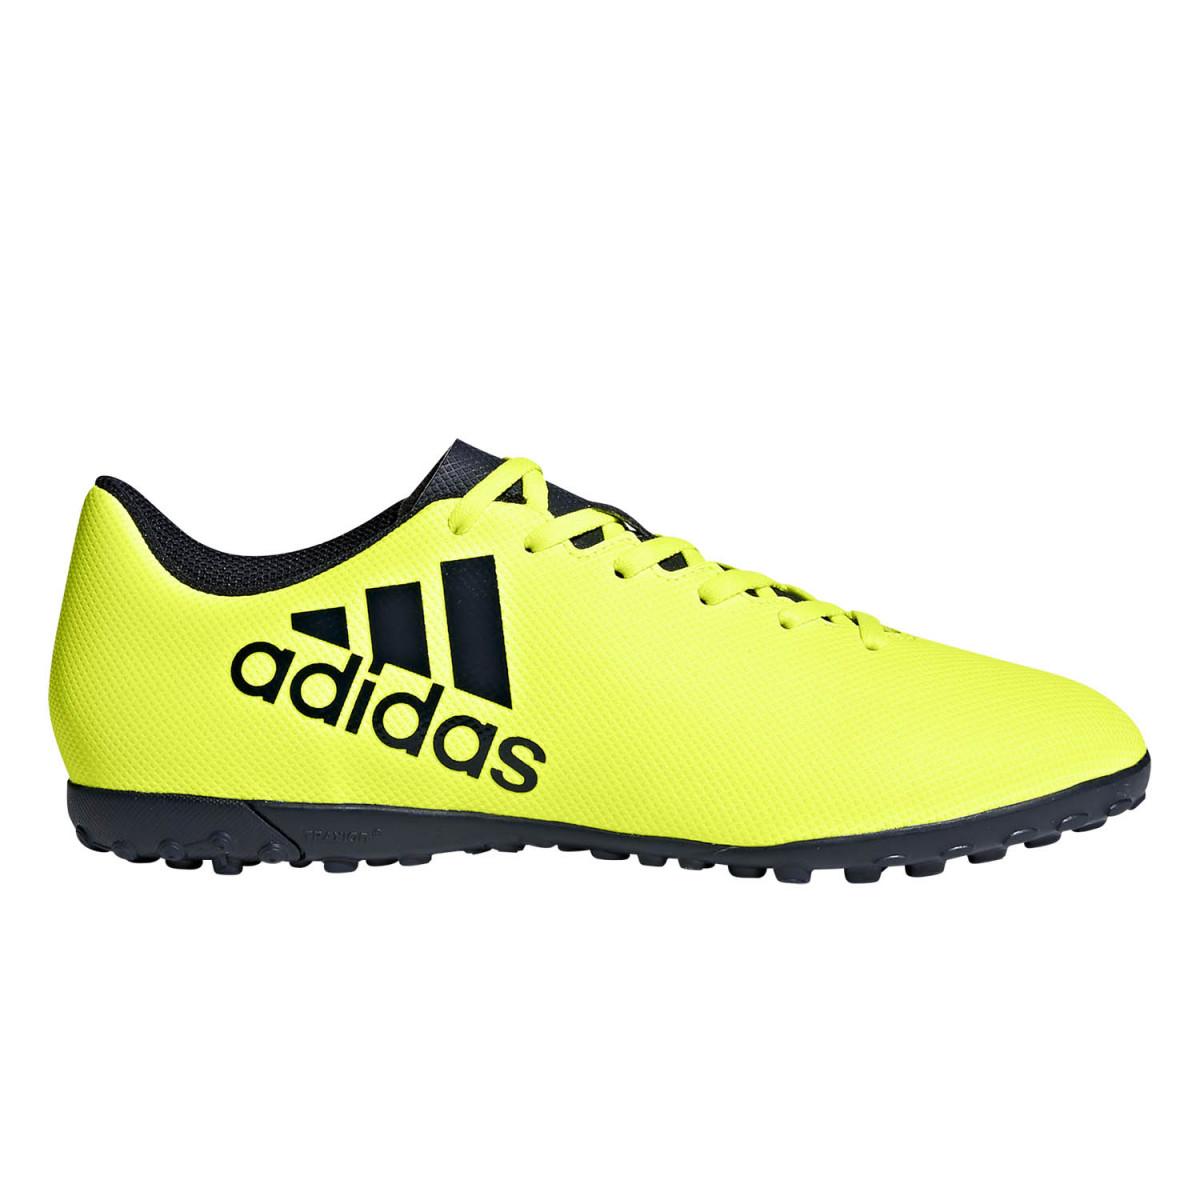 Botines Adidas X 17.4 Tf - Césped Sintético - Botines - Hombre b86cd988cdf84